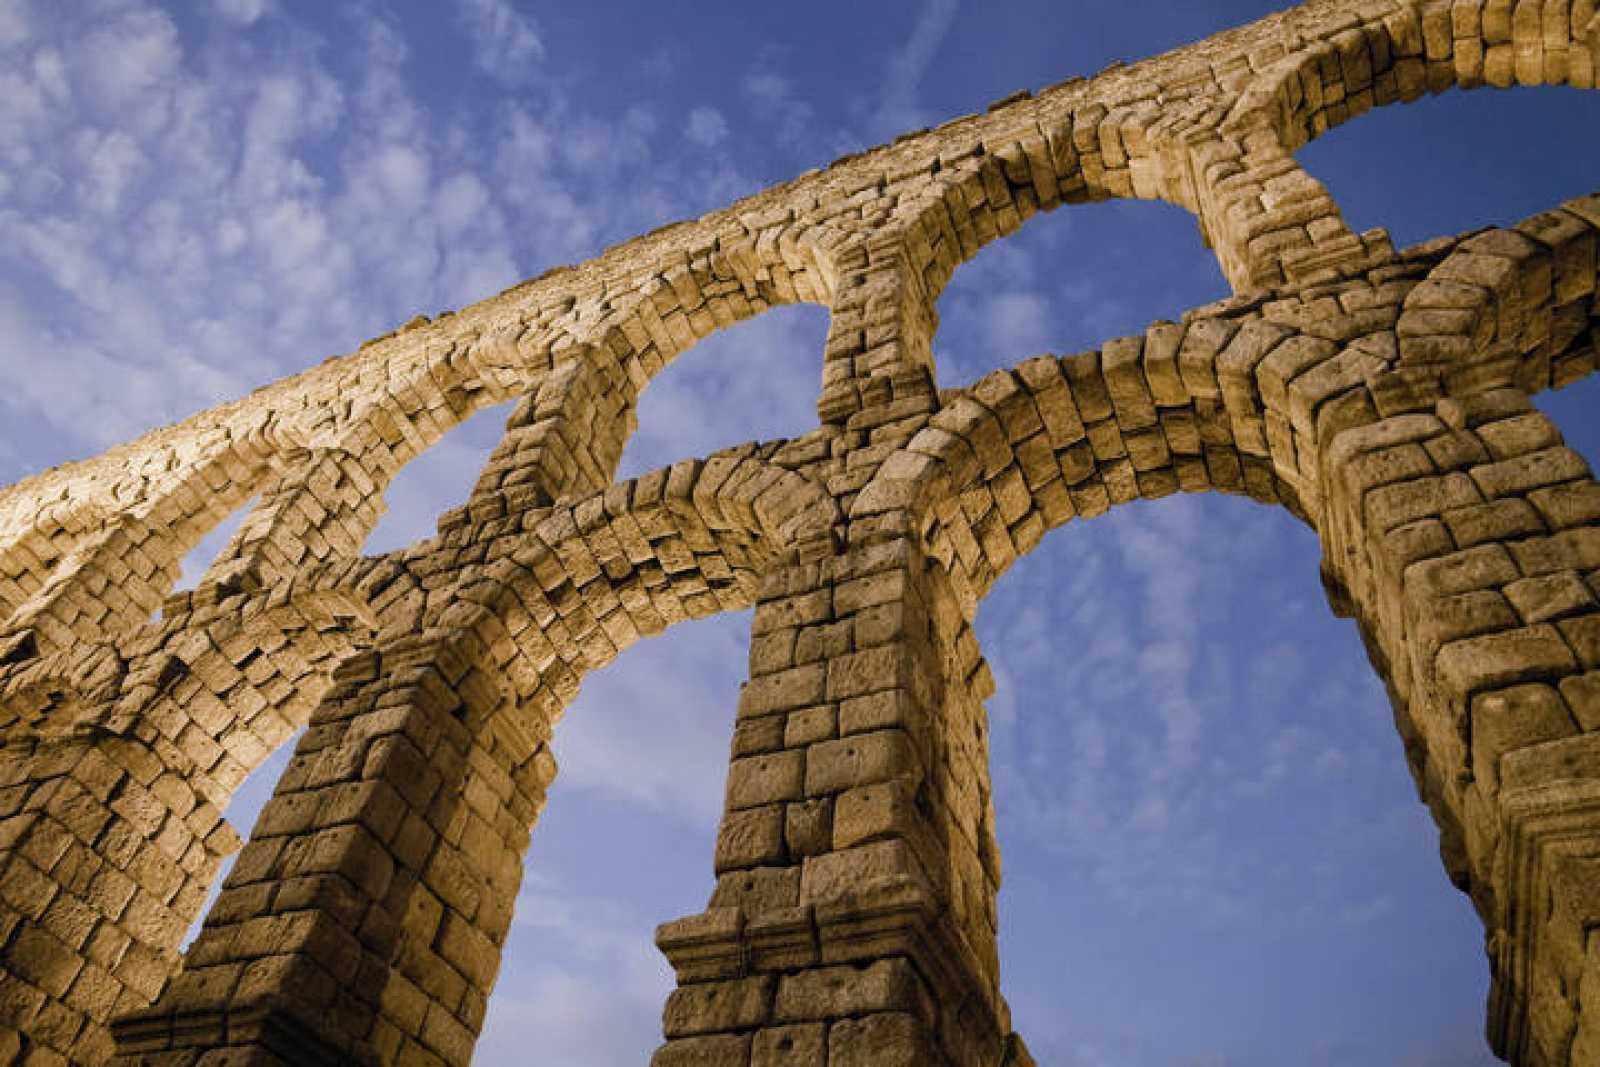 Acueducto de Segovia al anochecer.